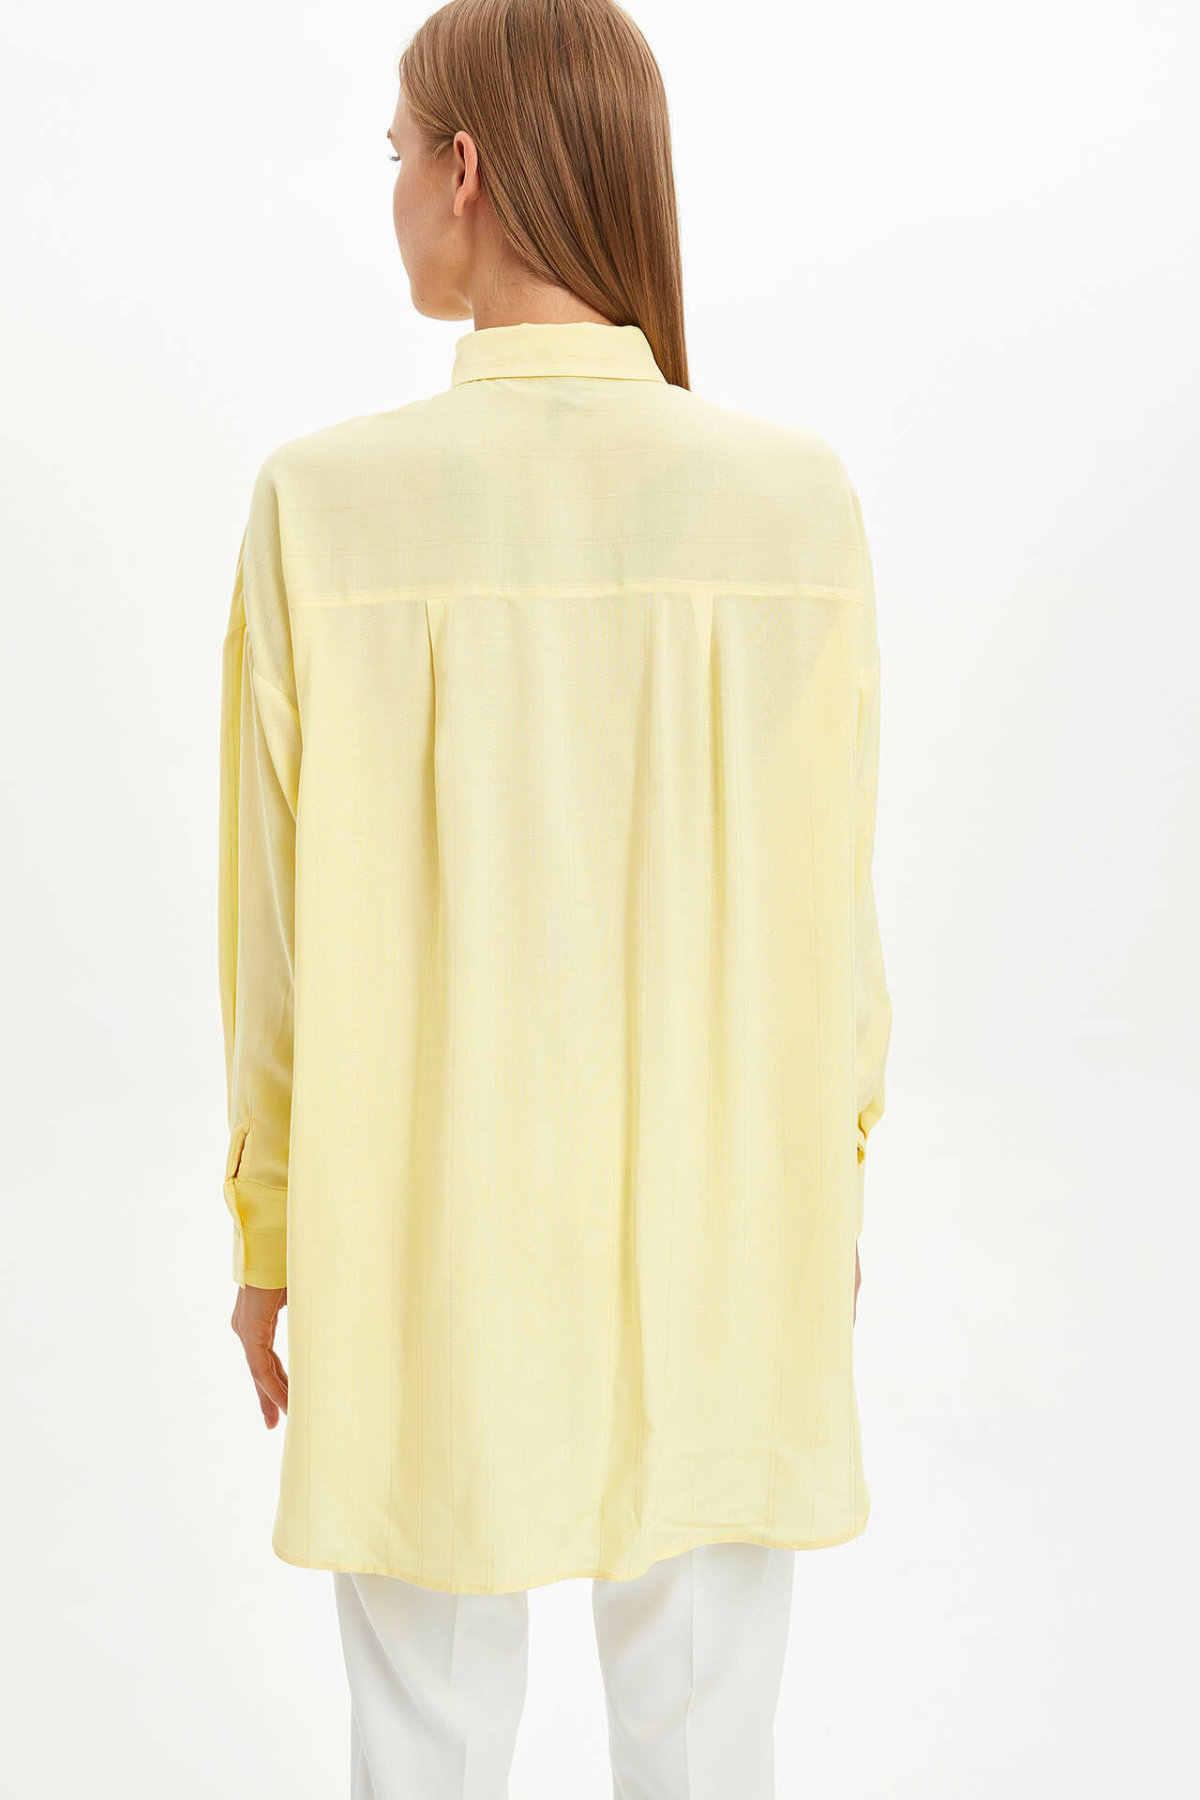 DeFacto פשוט גבירותיי אופנה חולצה נשי אלגנטי באיכות גבוהה ארוך נשים Loose צהוב חולצות אביב-L7320AZ19HS